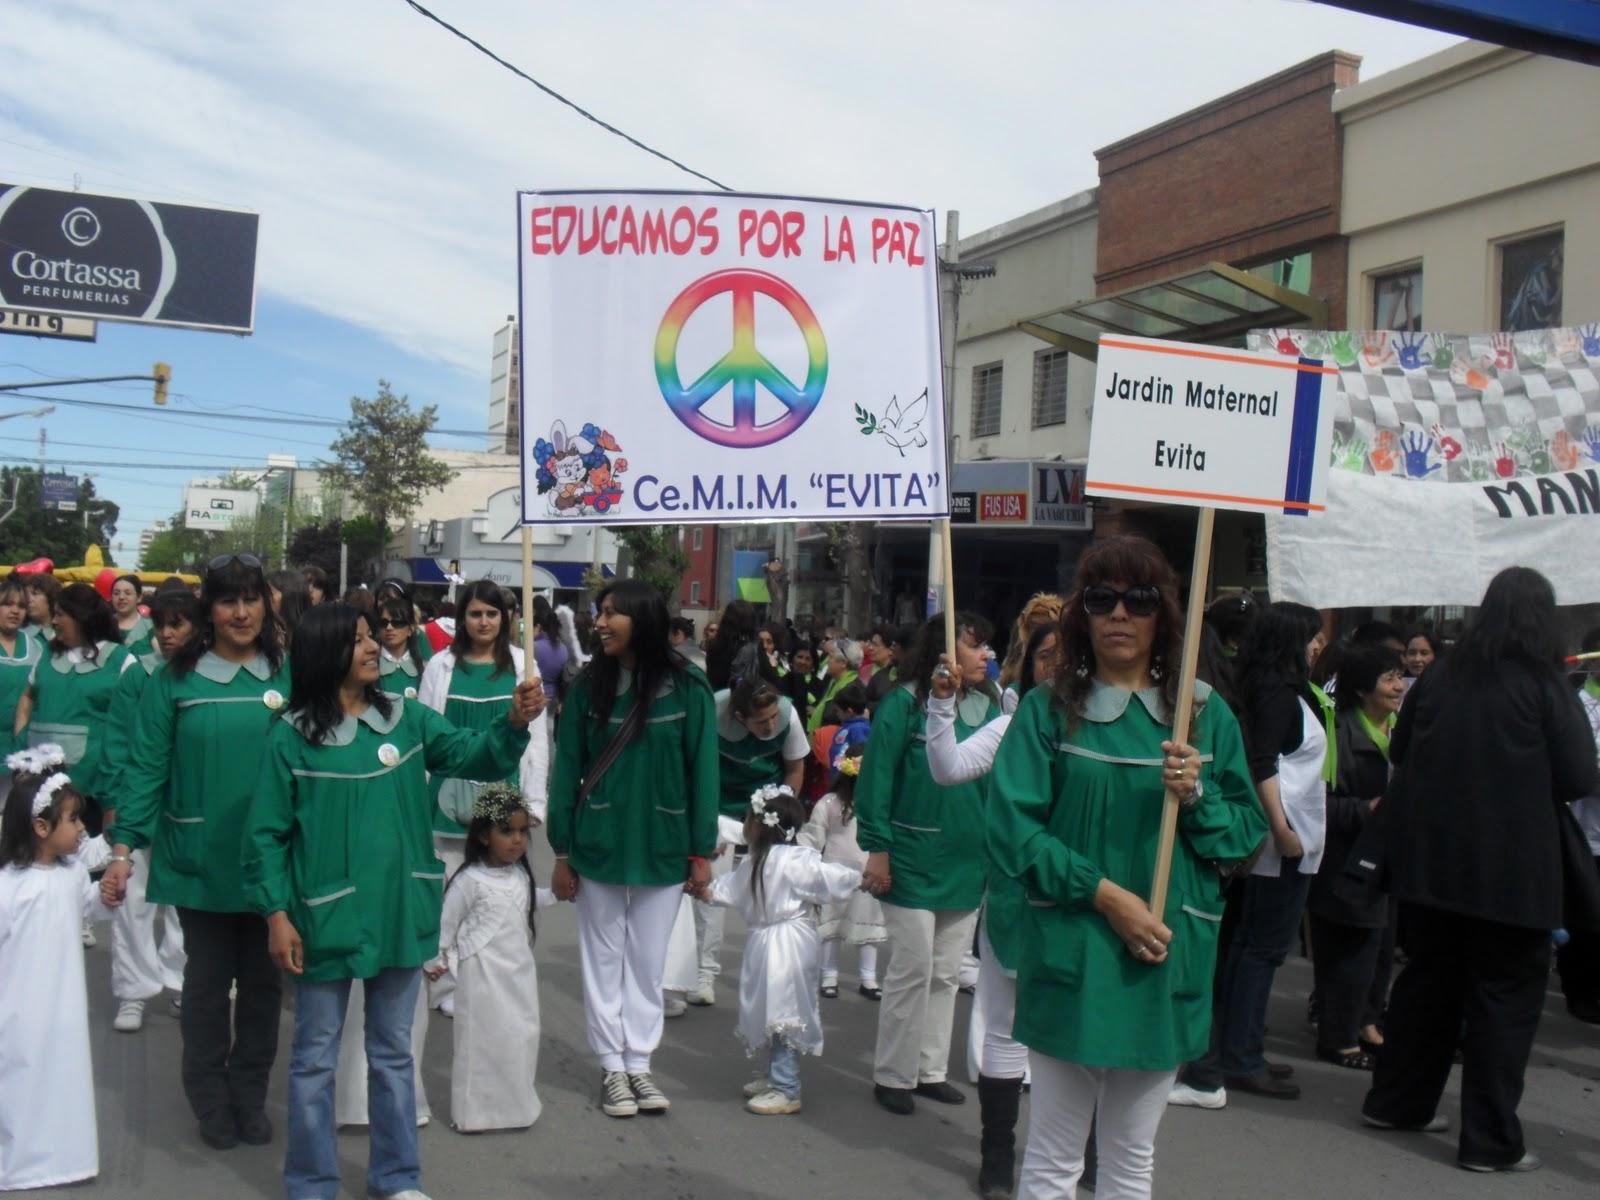 Jard n maternal evita trelew desfile aniversario de la for Jardin 427 trelew